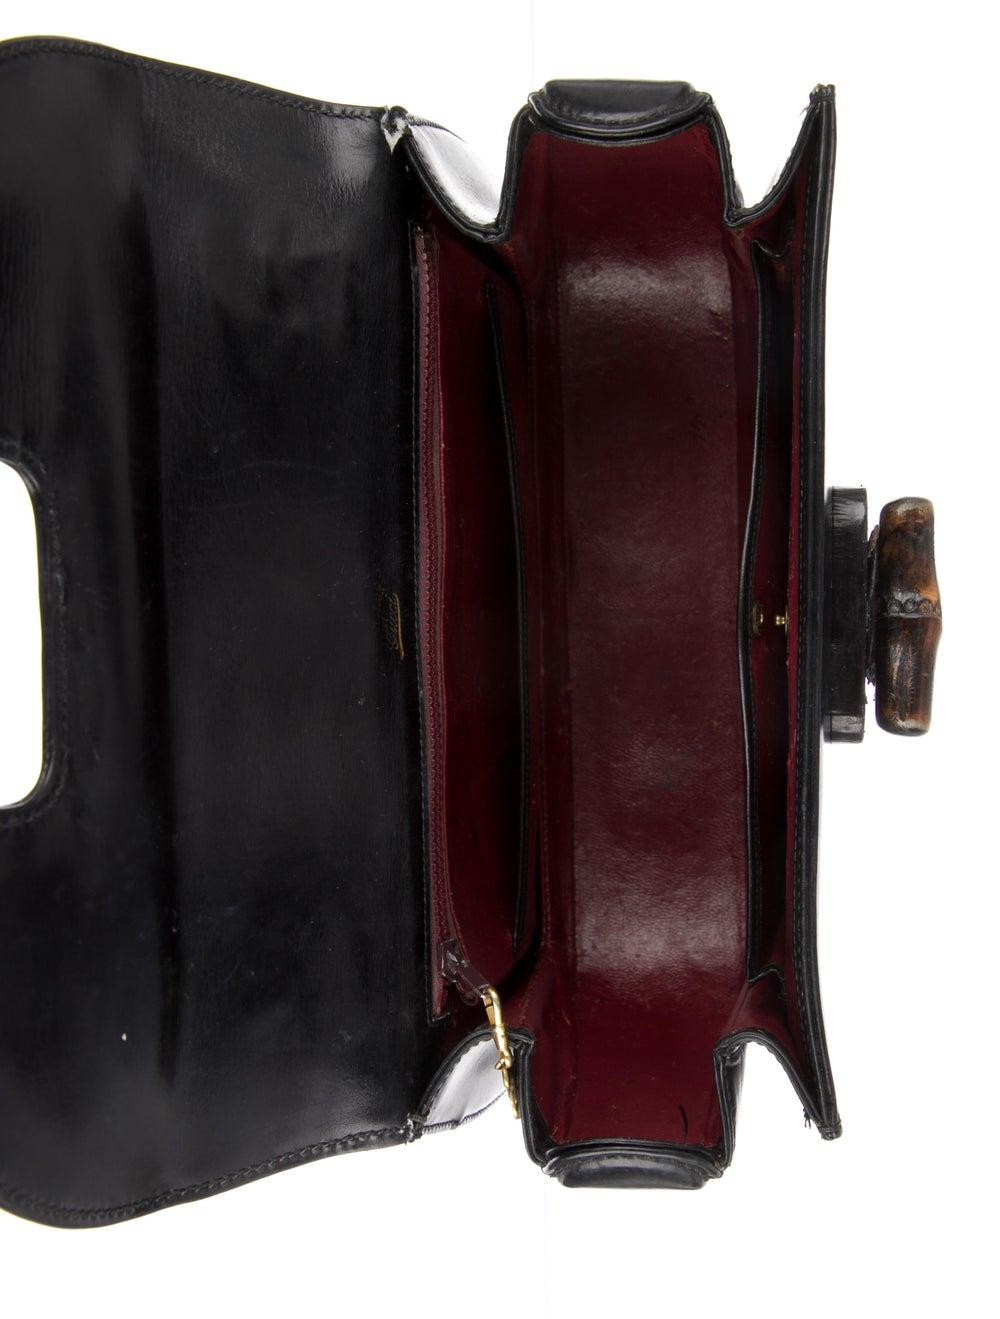 Gucci Vintage Leather Bamboo Top Handle Bag Black - image 5